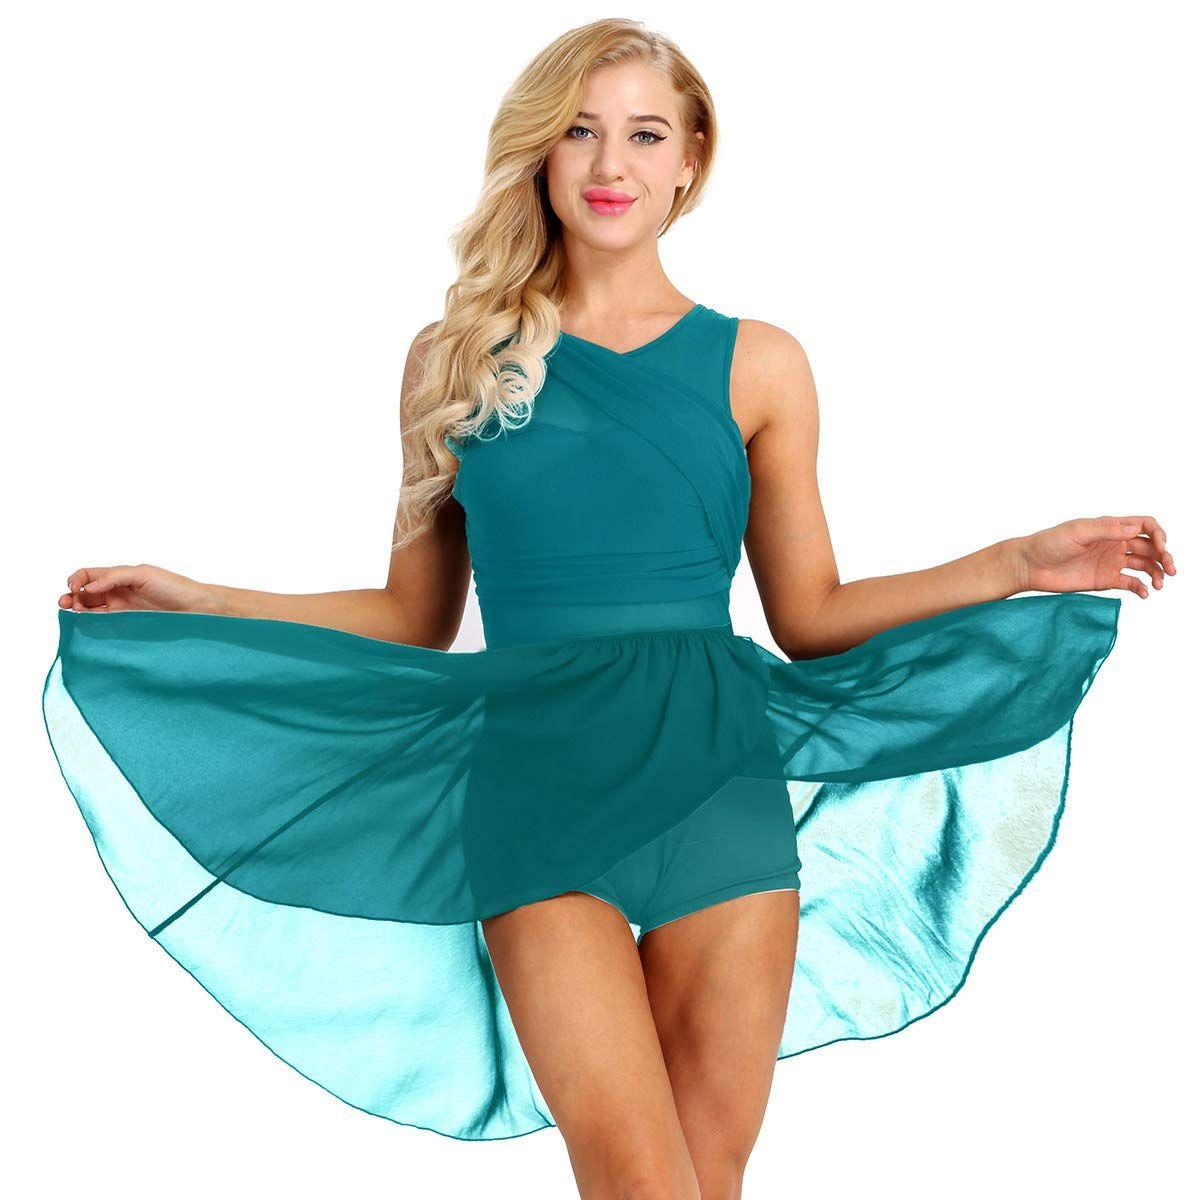 4bddc5184481 MSemis Women's Asymmetric Ballet Chiffon Skirt Warp Dress Gymnastic  Athletic Cutout Back Leotard Dance Costumes Lyrical